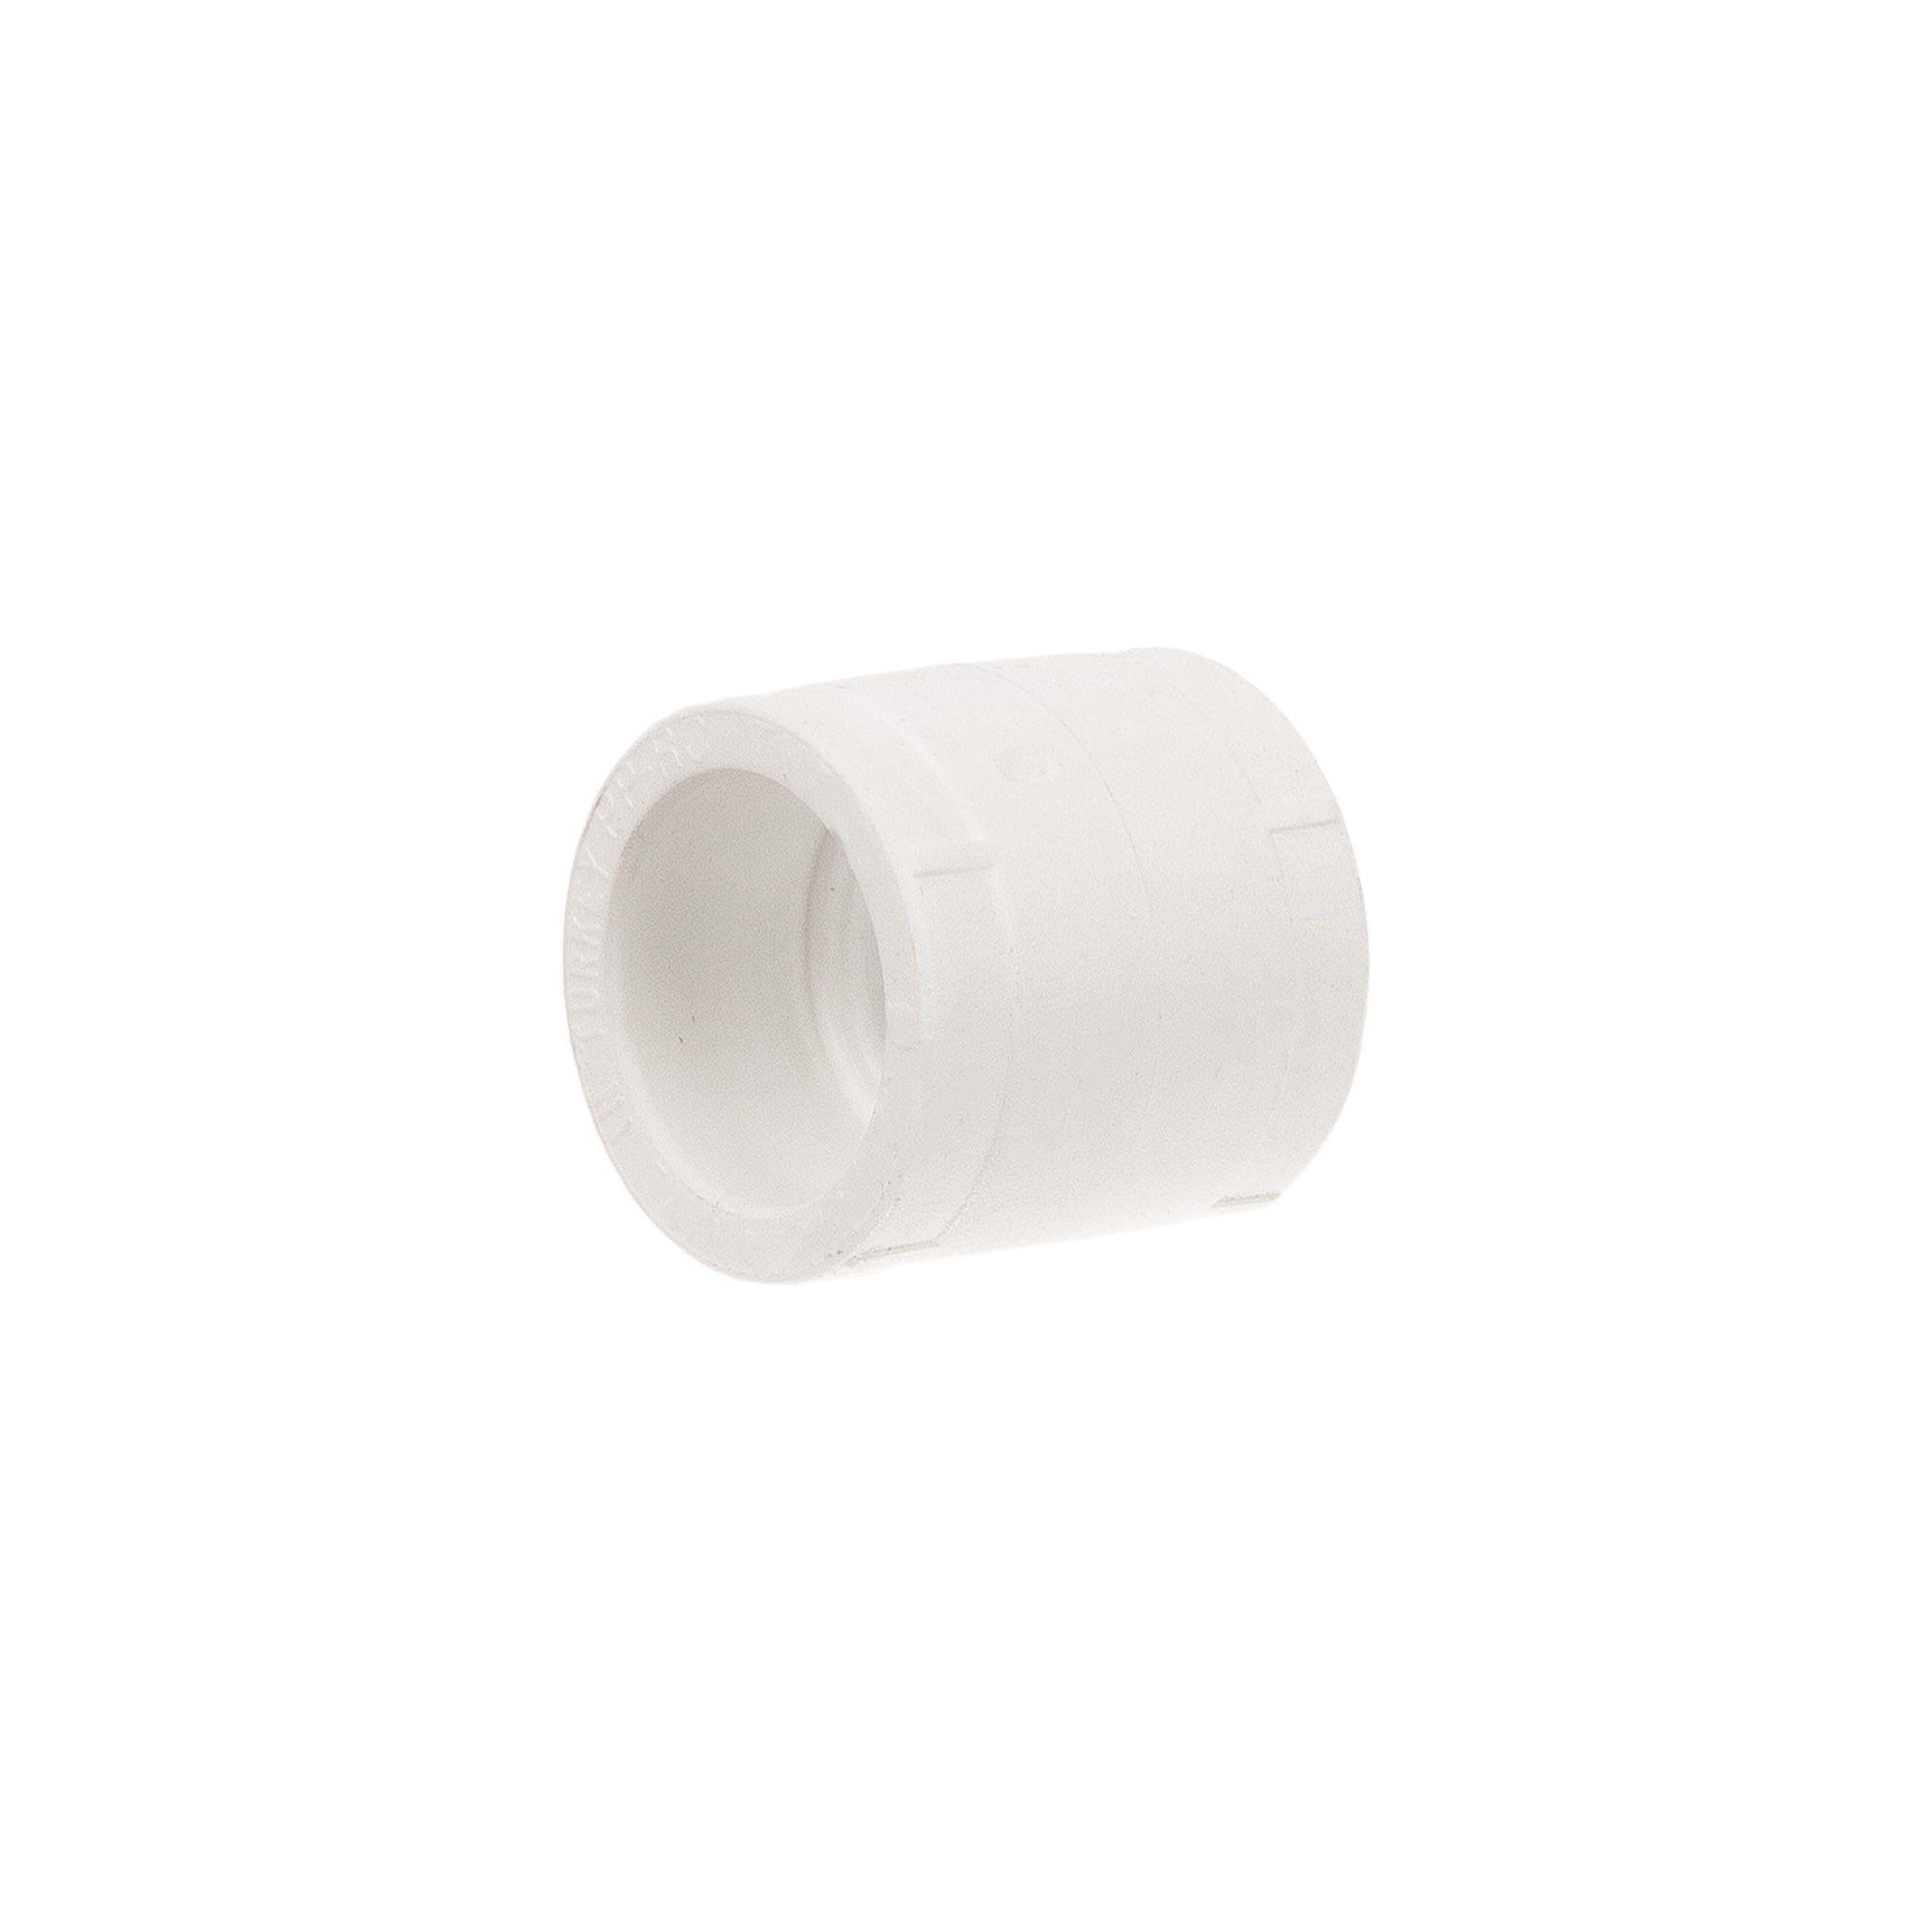 Mufa PPR 40 mm